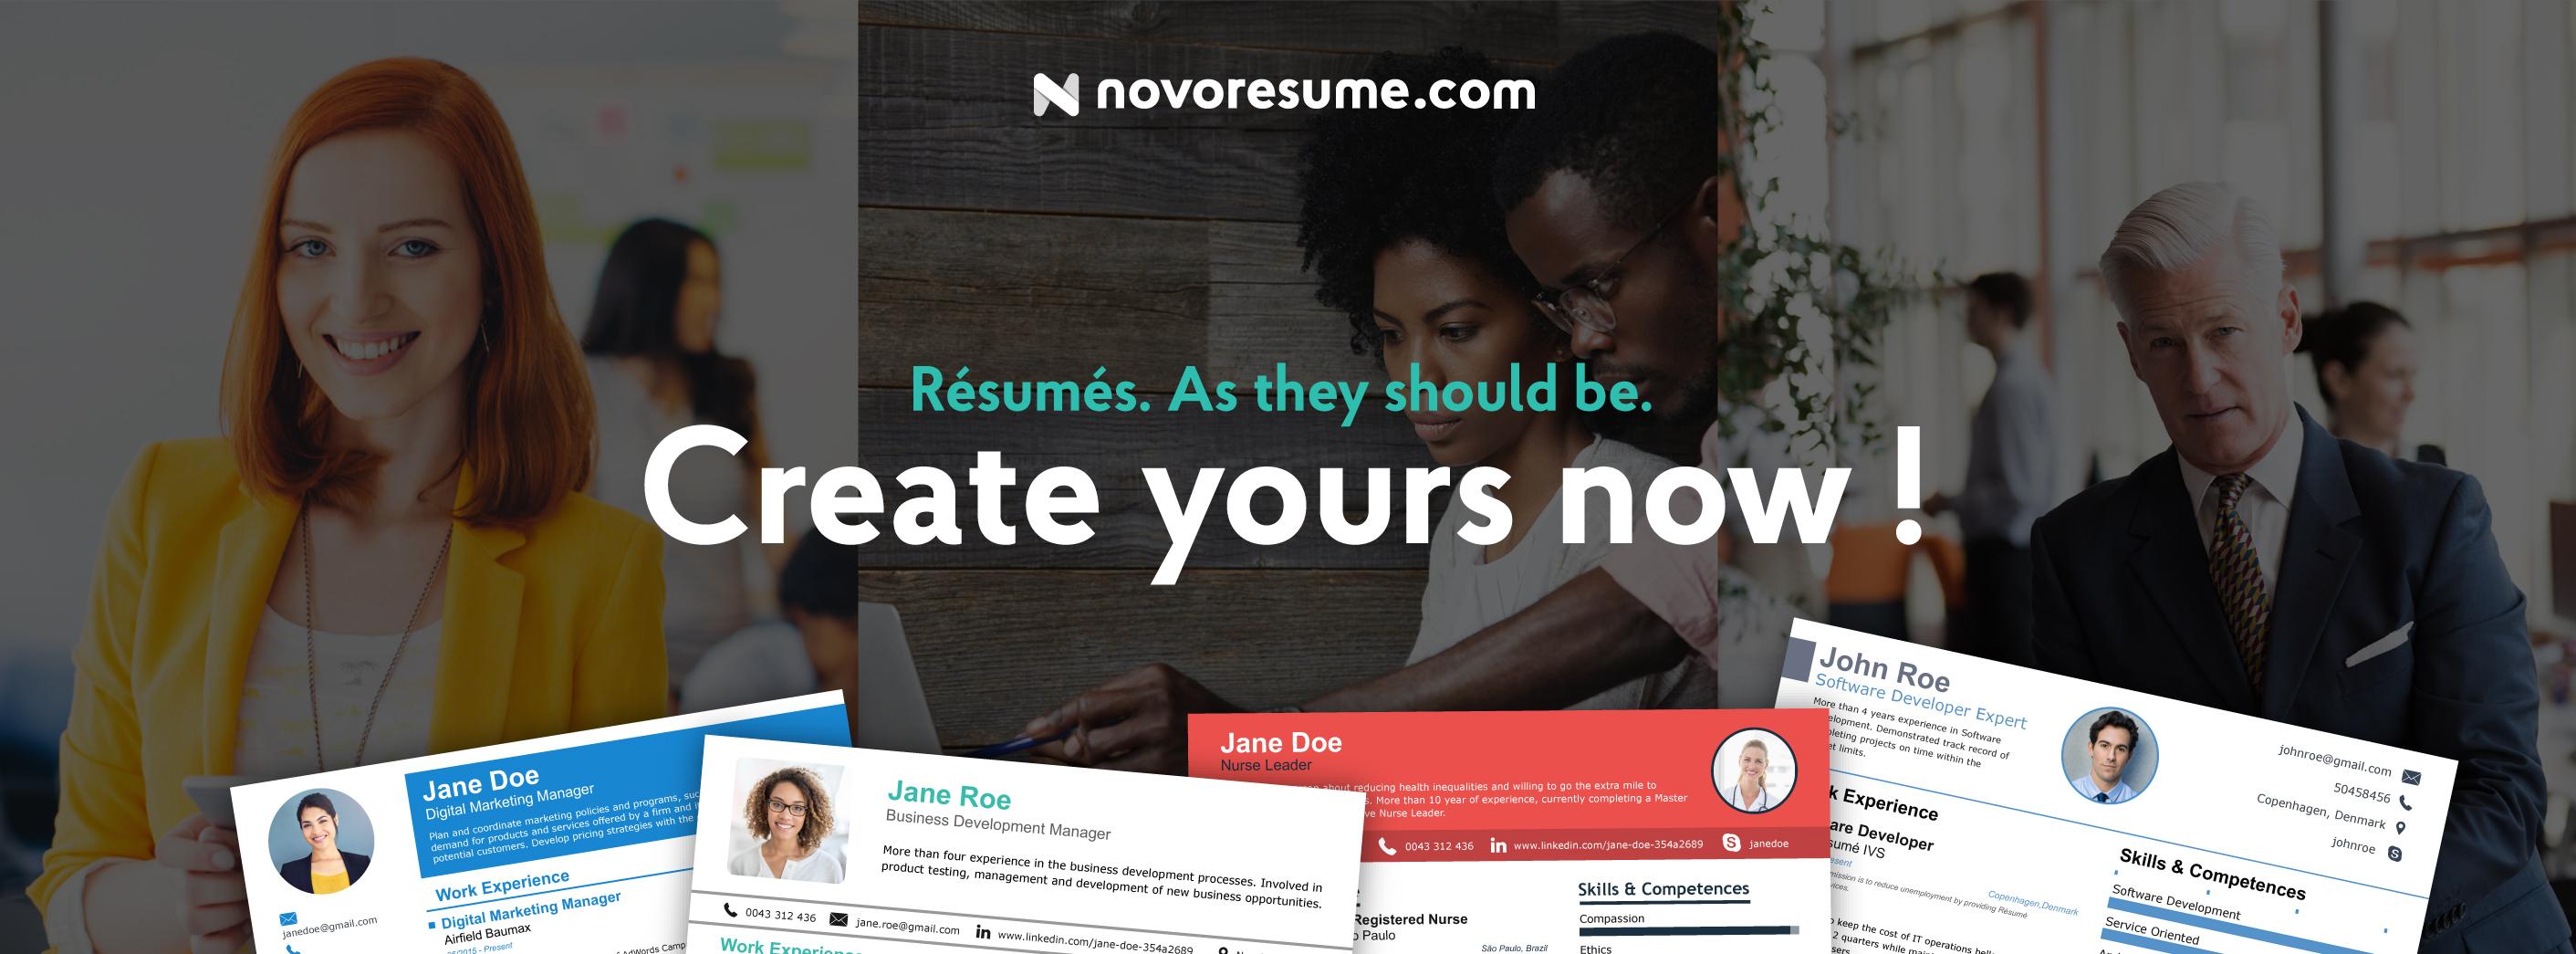 novoresume startup danemarca cv curriculum vitae